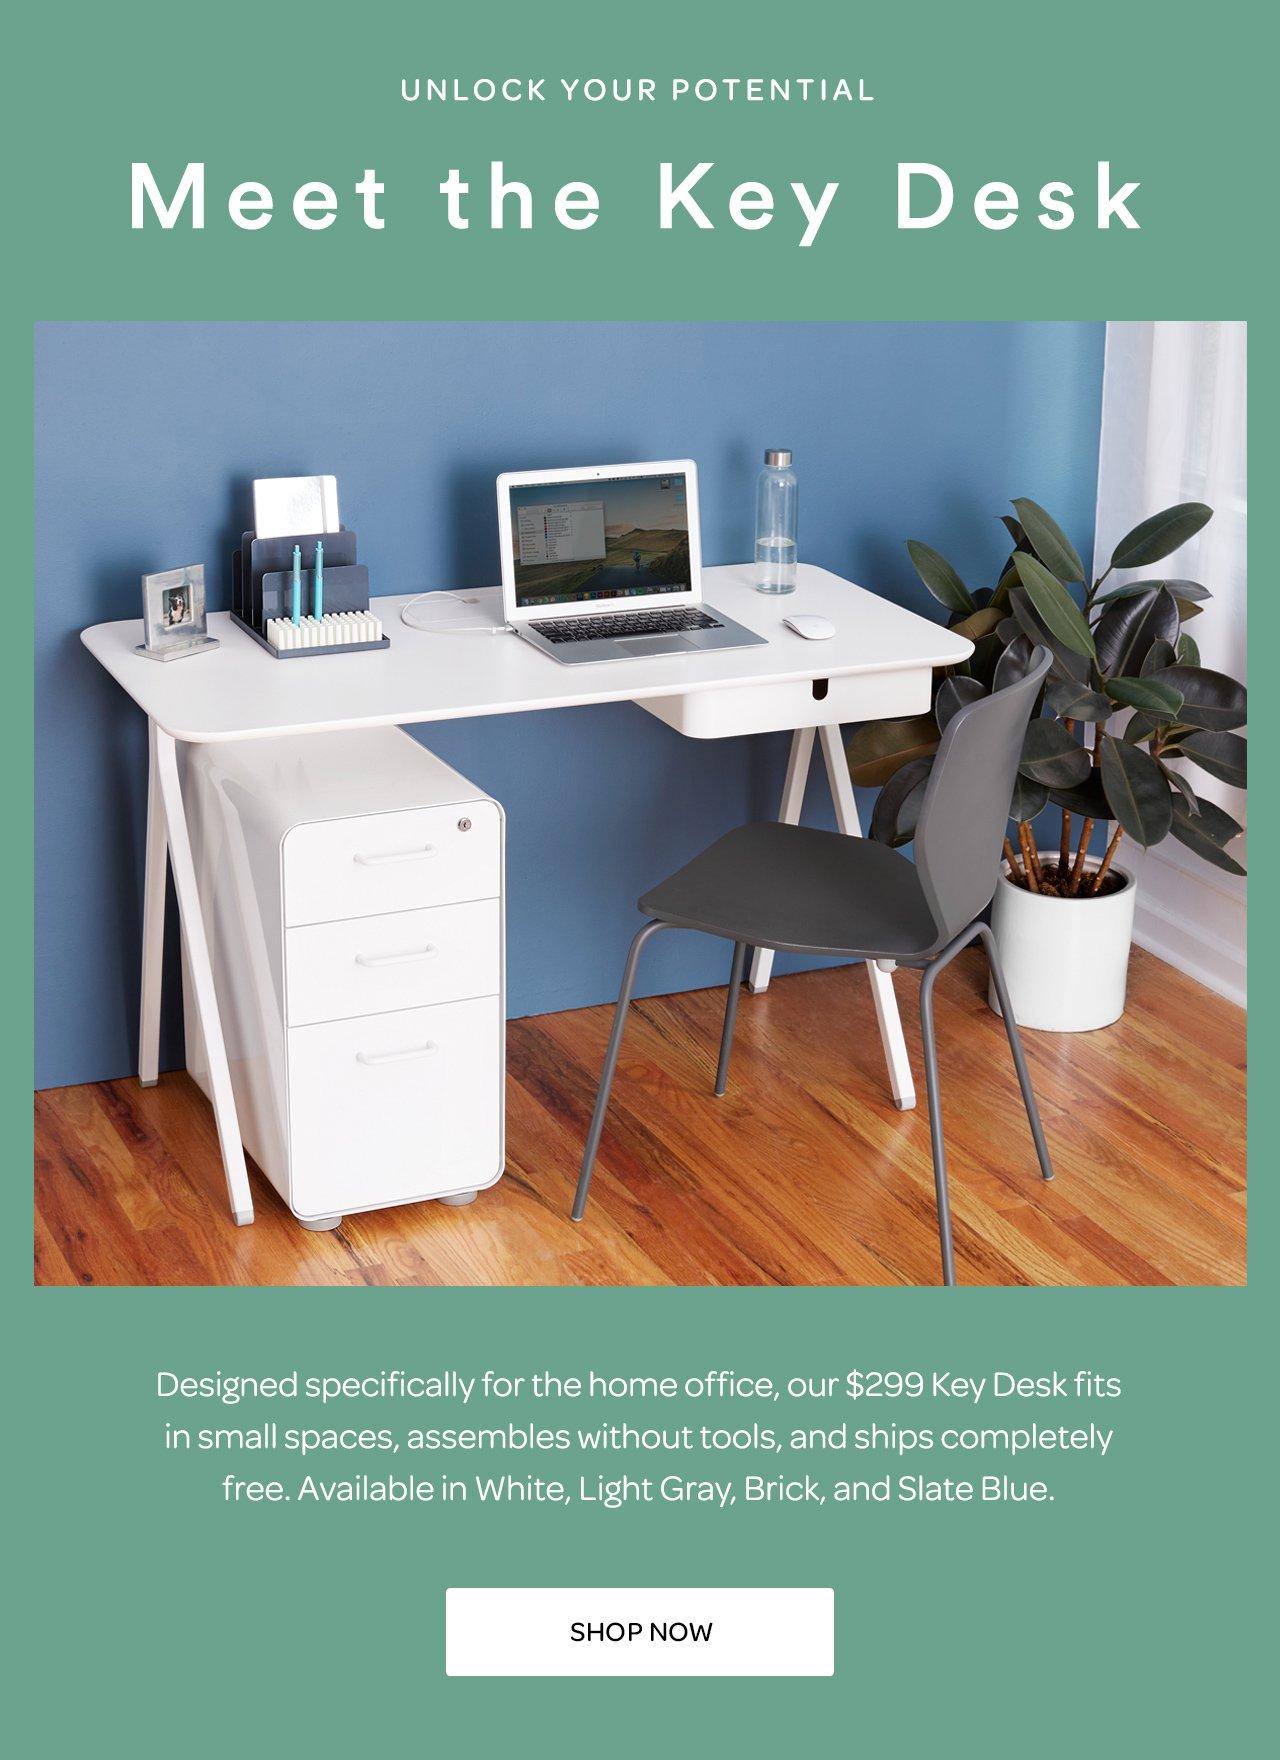 Key Desk